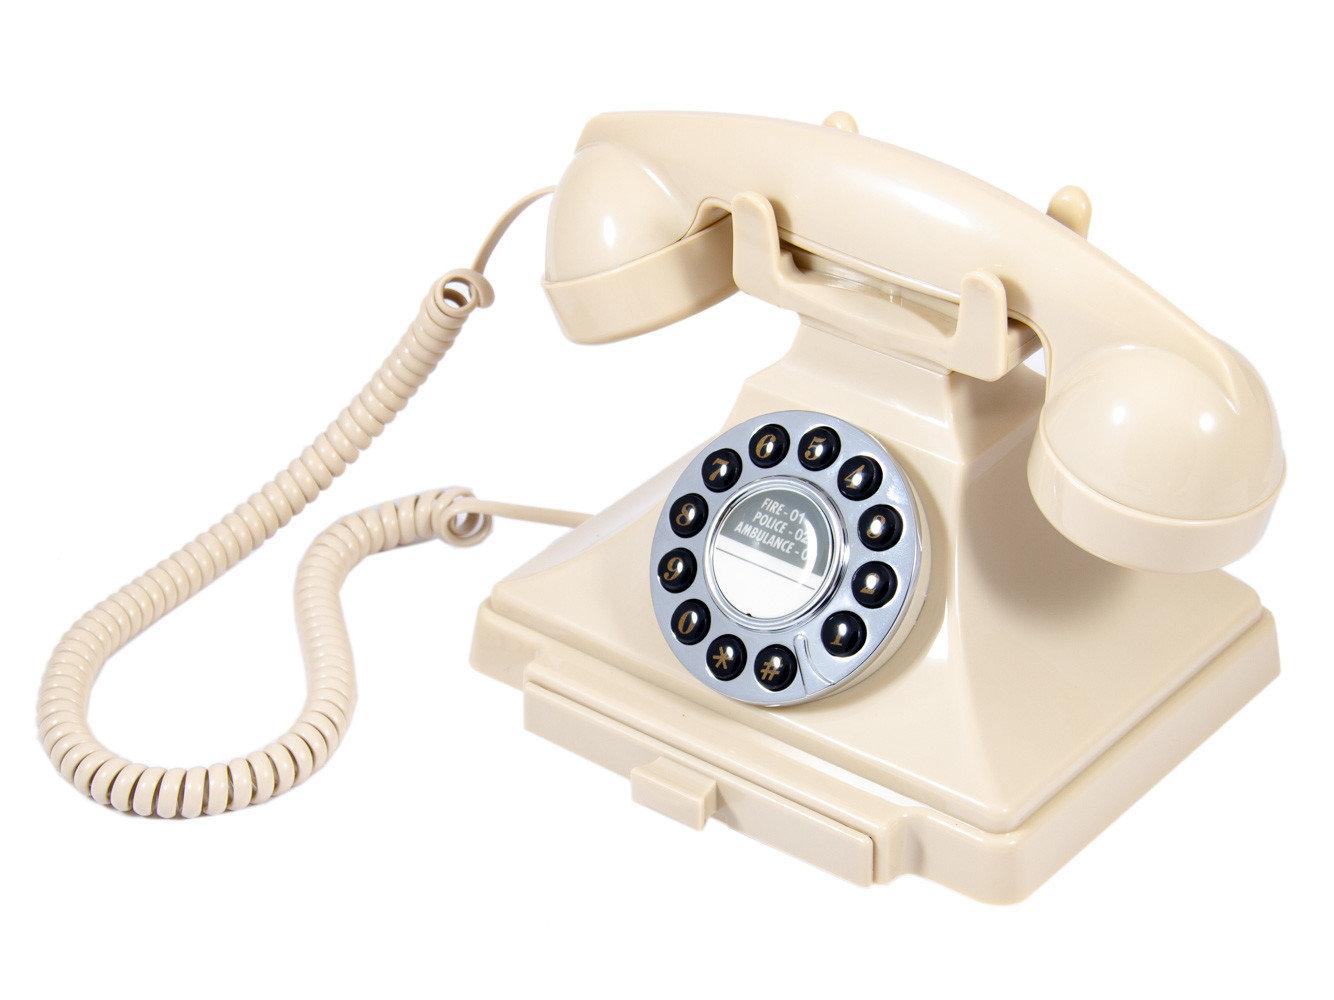 Телефон-ретро, 23x12x19 см, арт. 98911